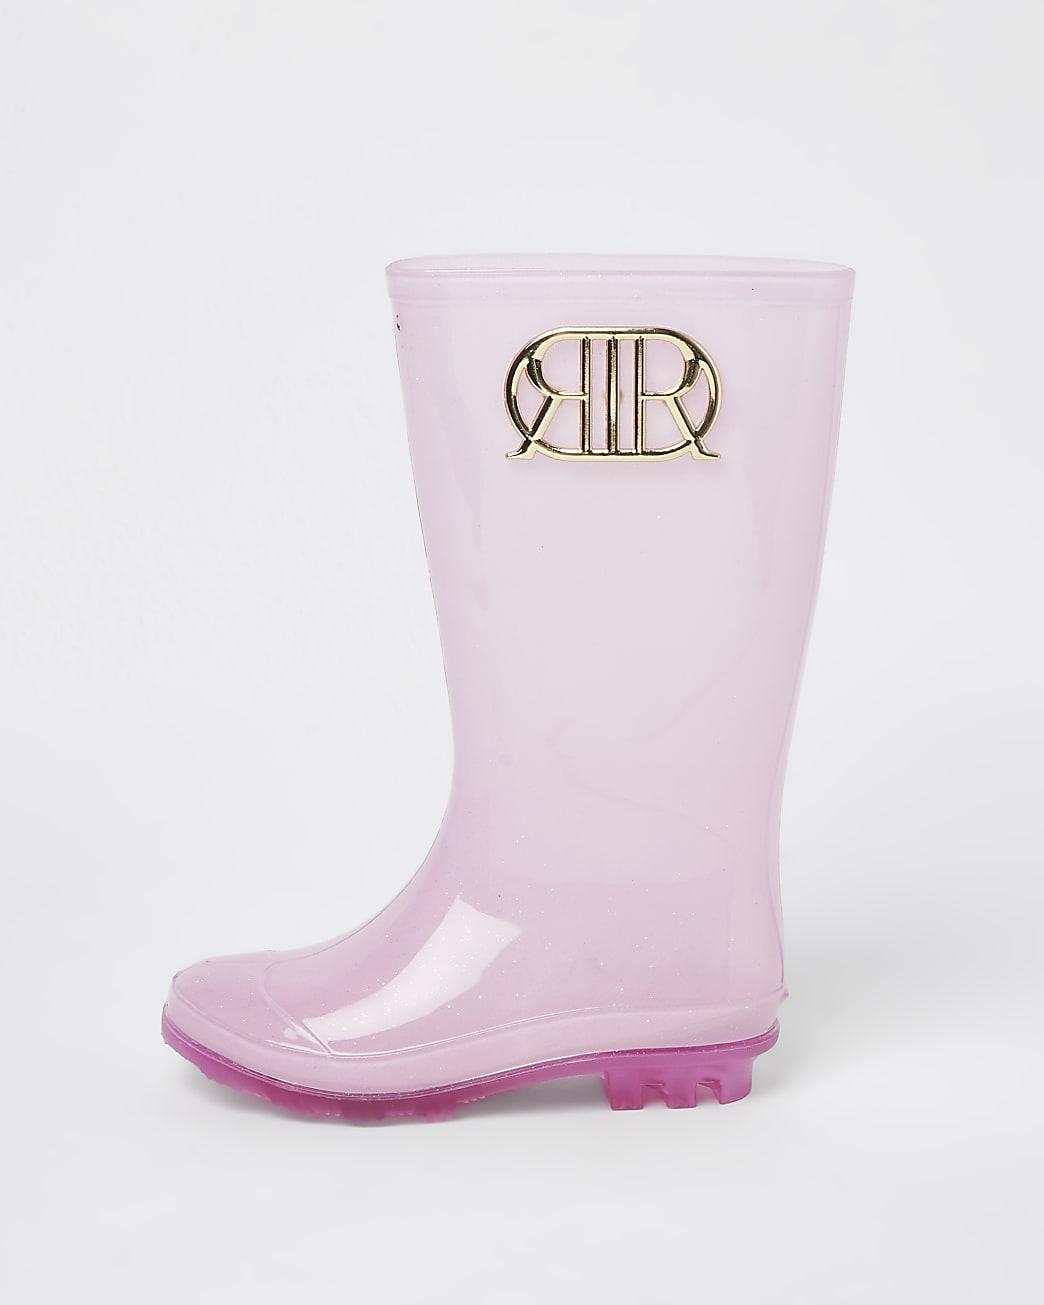 Girls pink RIR wellie boots